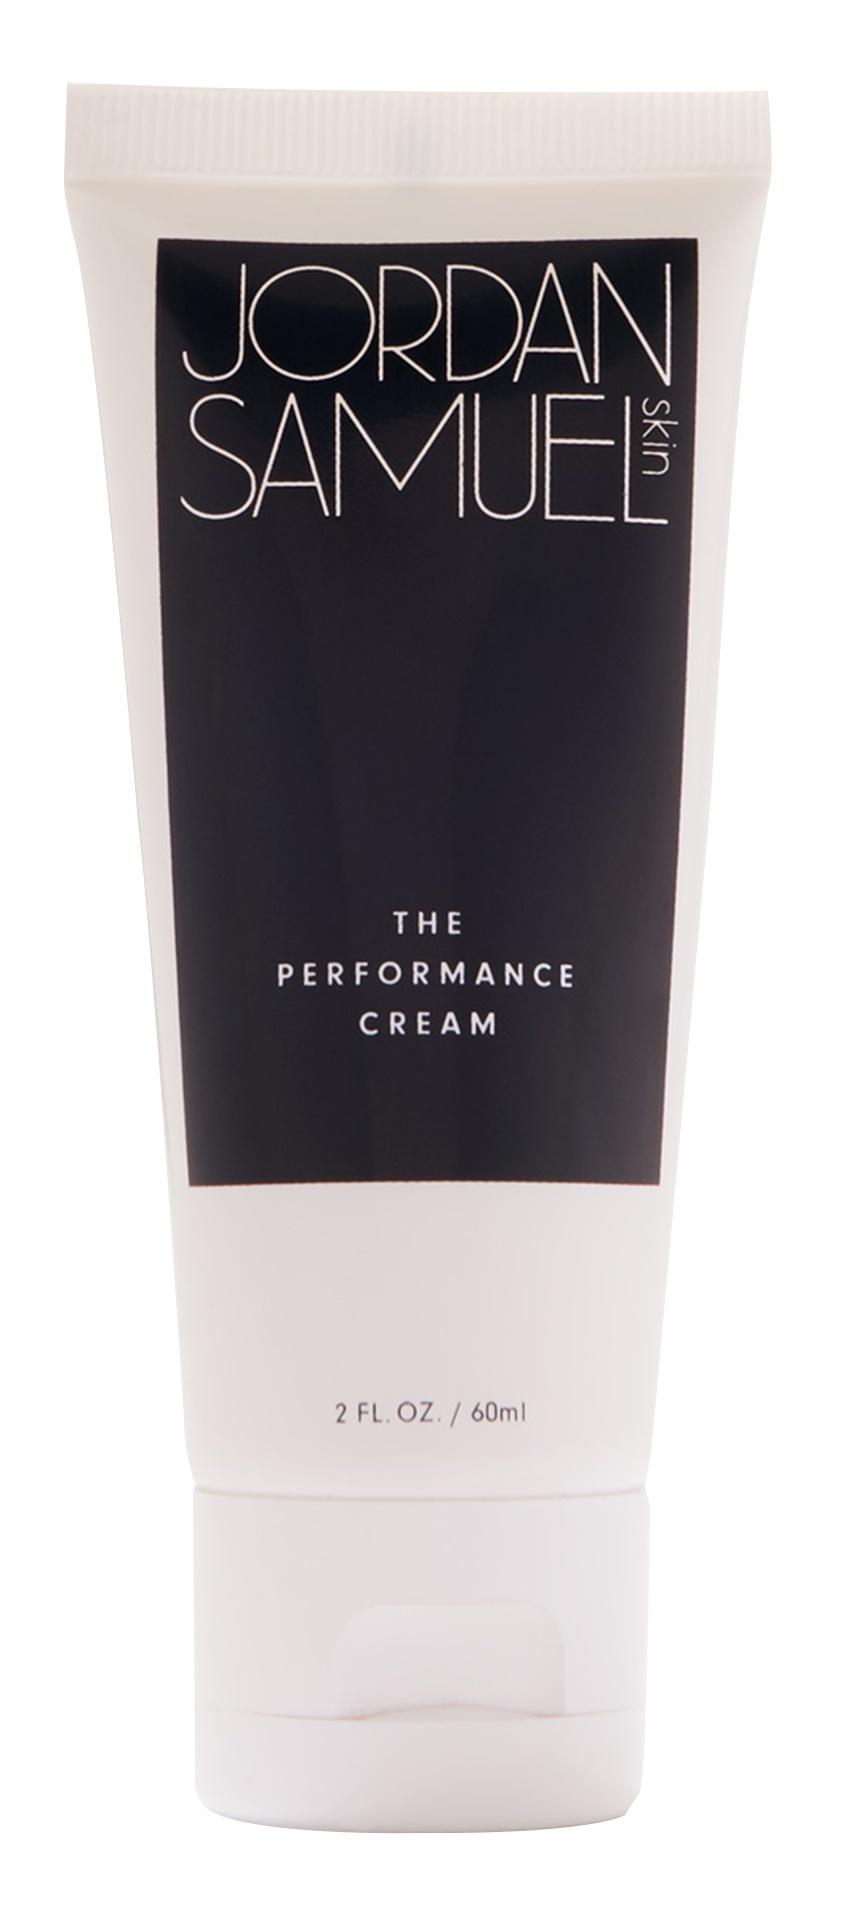 Jordan Samuel The Performance Cream